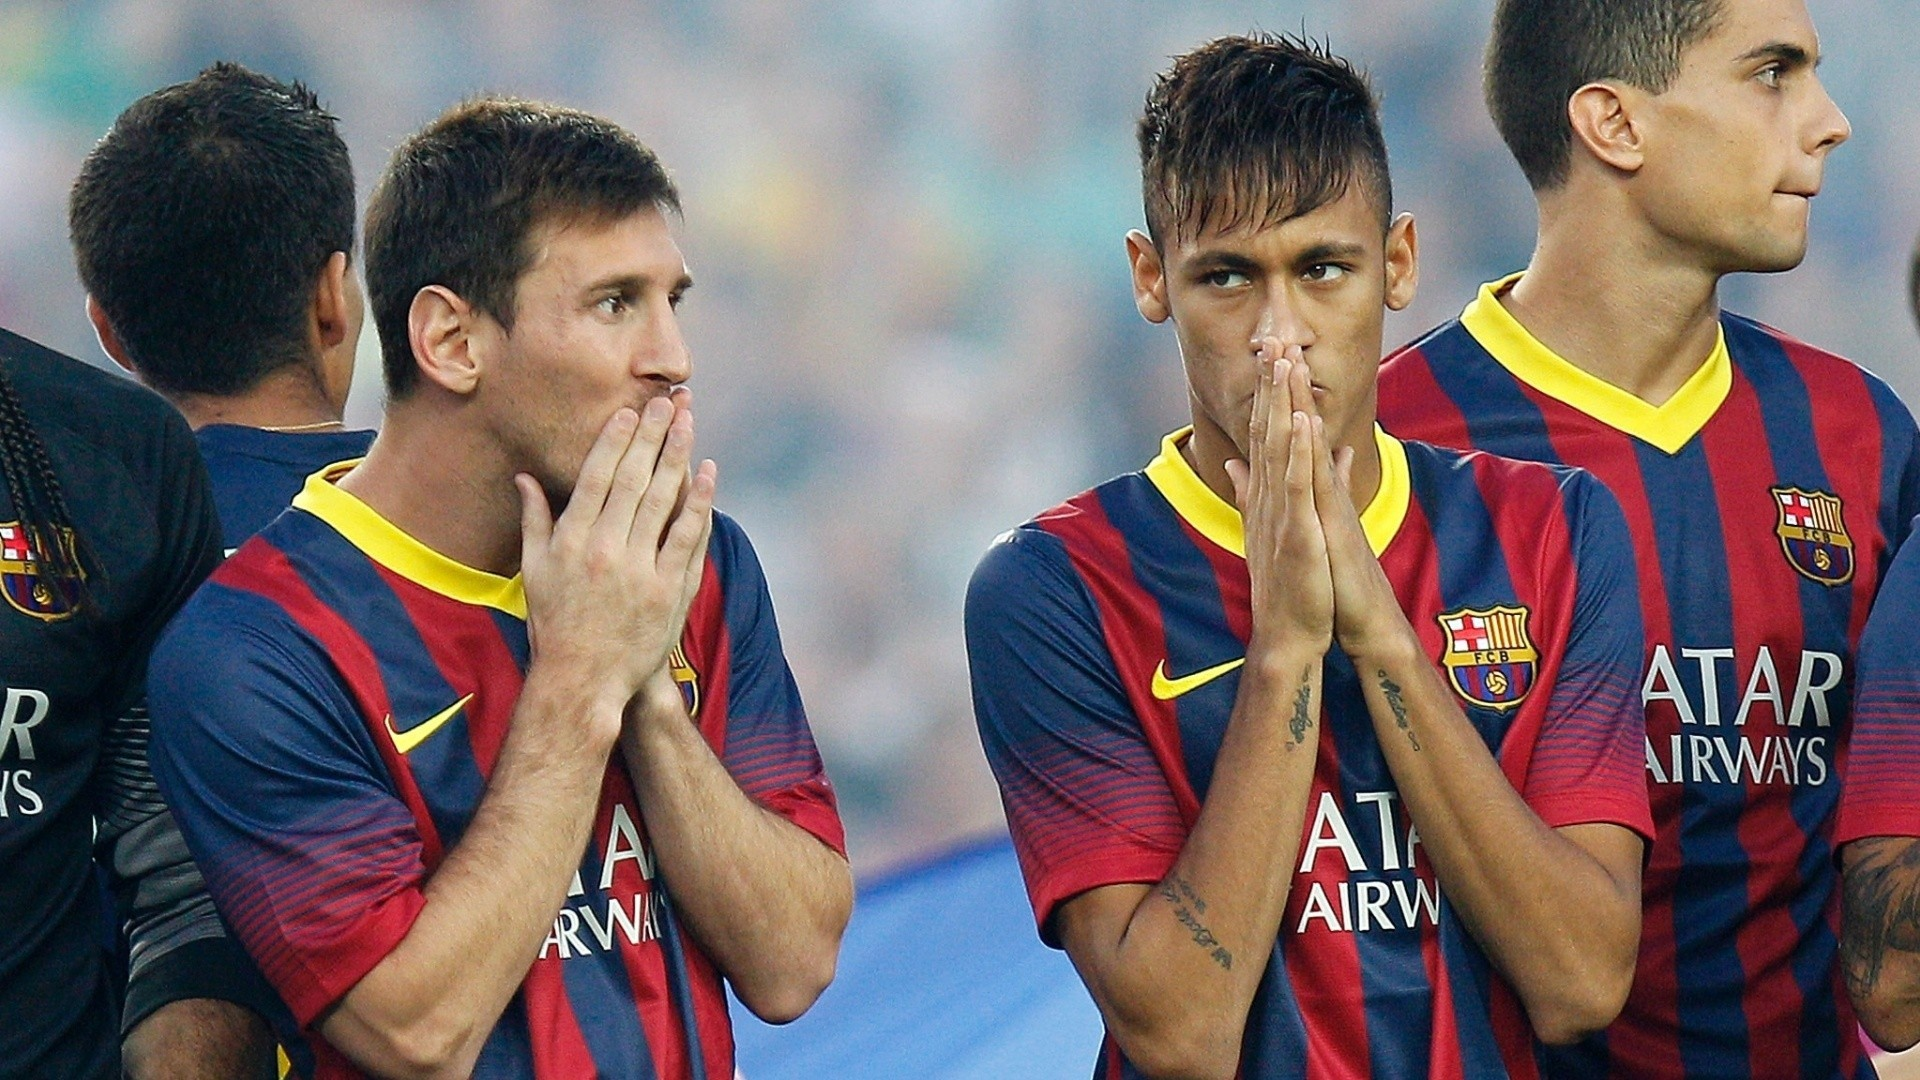 Lionel Messi Neymar Wallpaper – Football HD Wallpapers